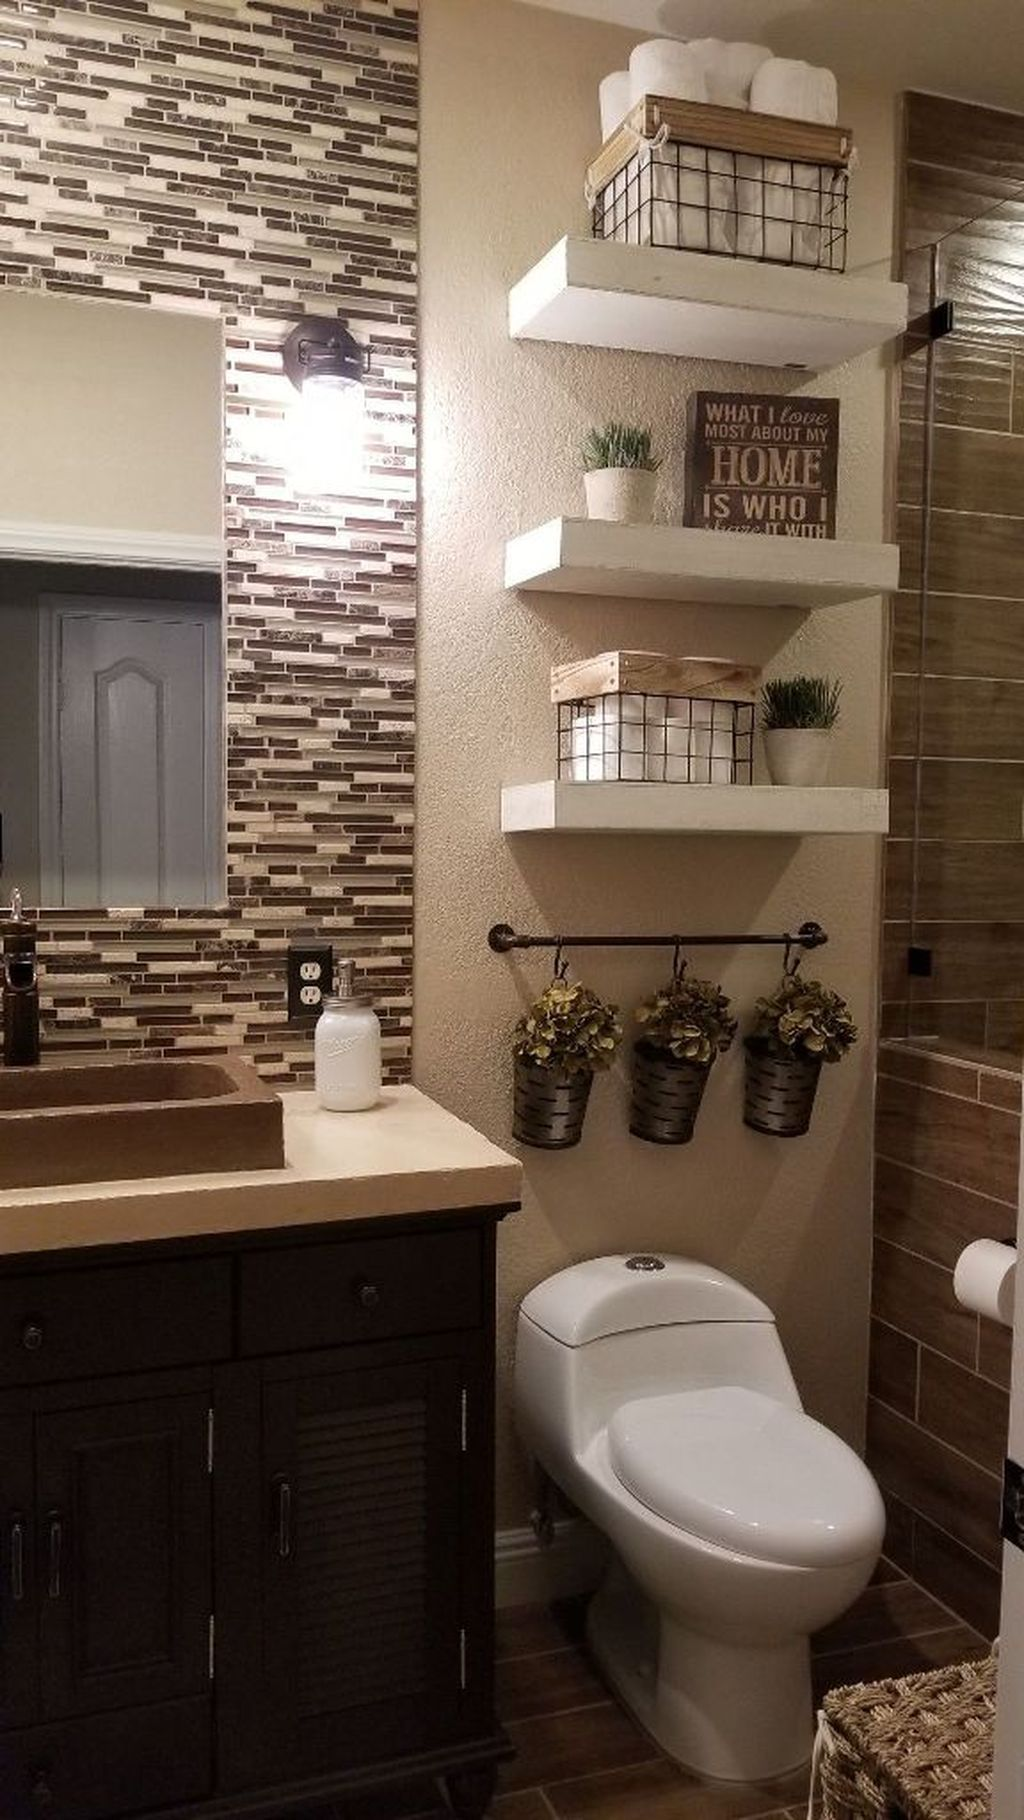 39 Incredible Small Bathroom Remodel Ideas You Must Try Diy Bathroom Remodel Small Bathroom Remodel Bathroom Design Small